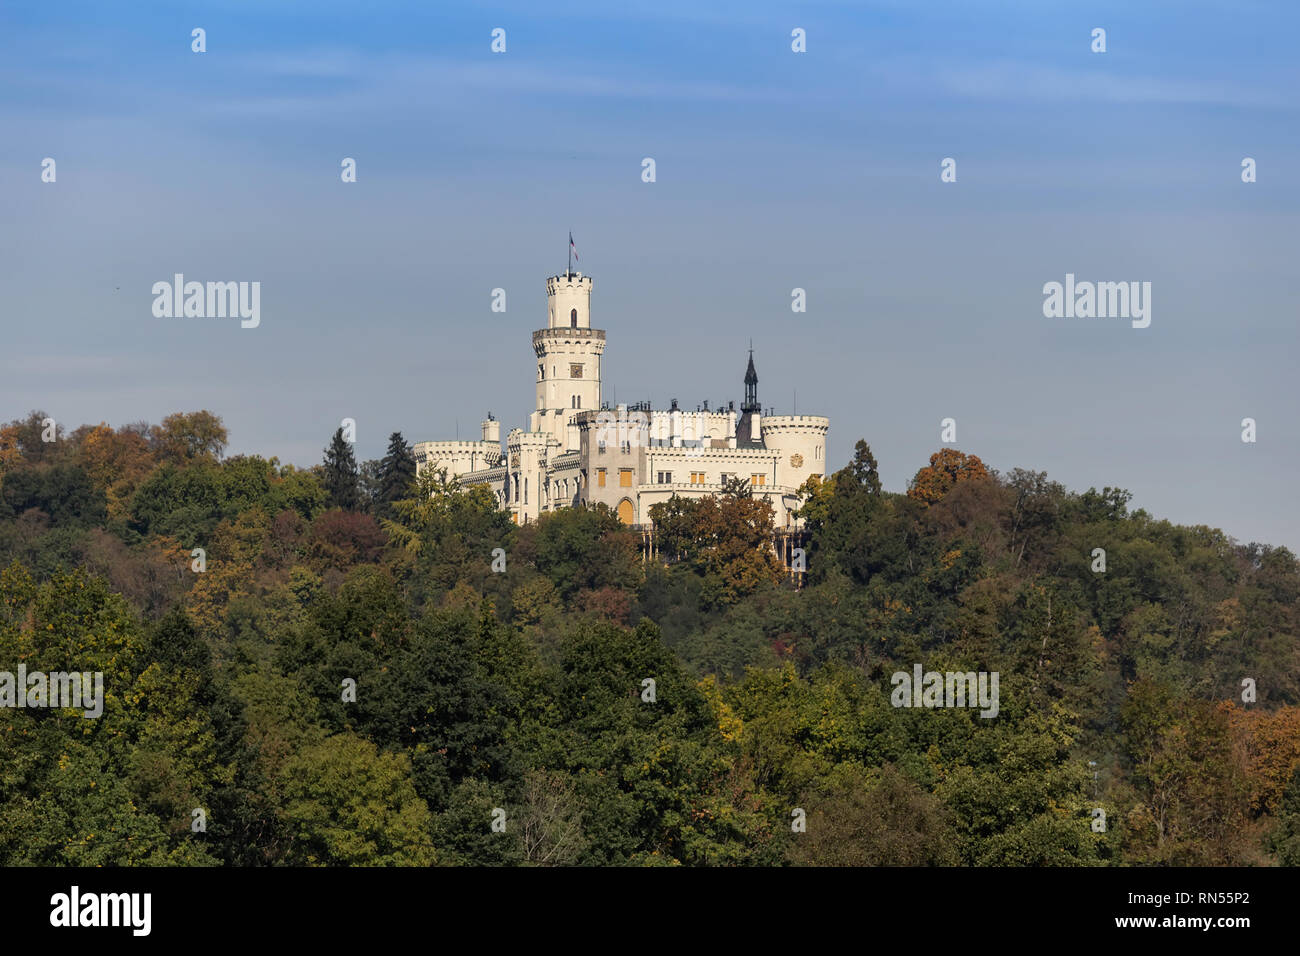 Castle Hluboka nad Vltavou with autumn trees - Stock Image